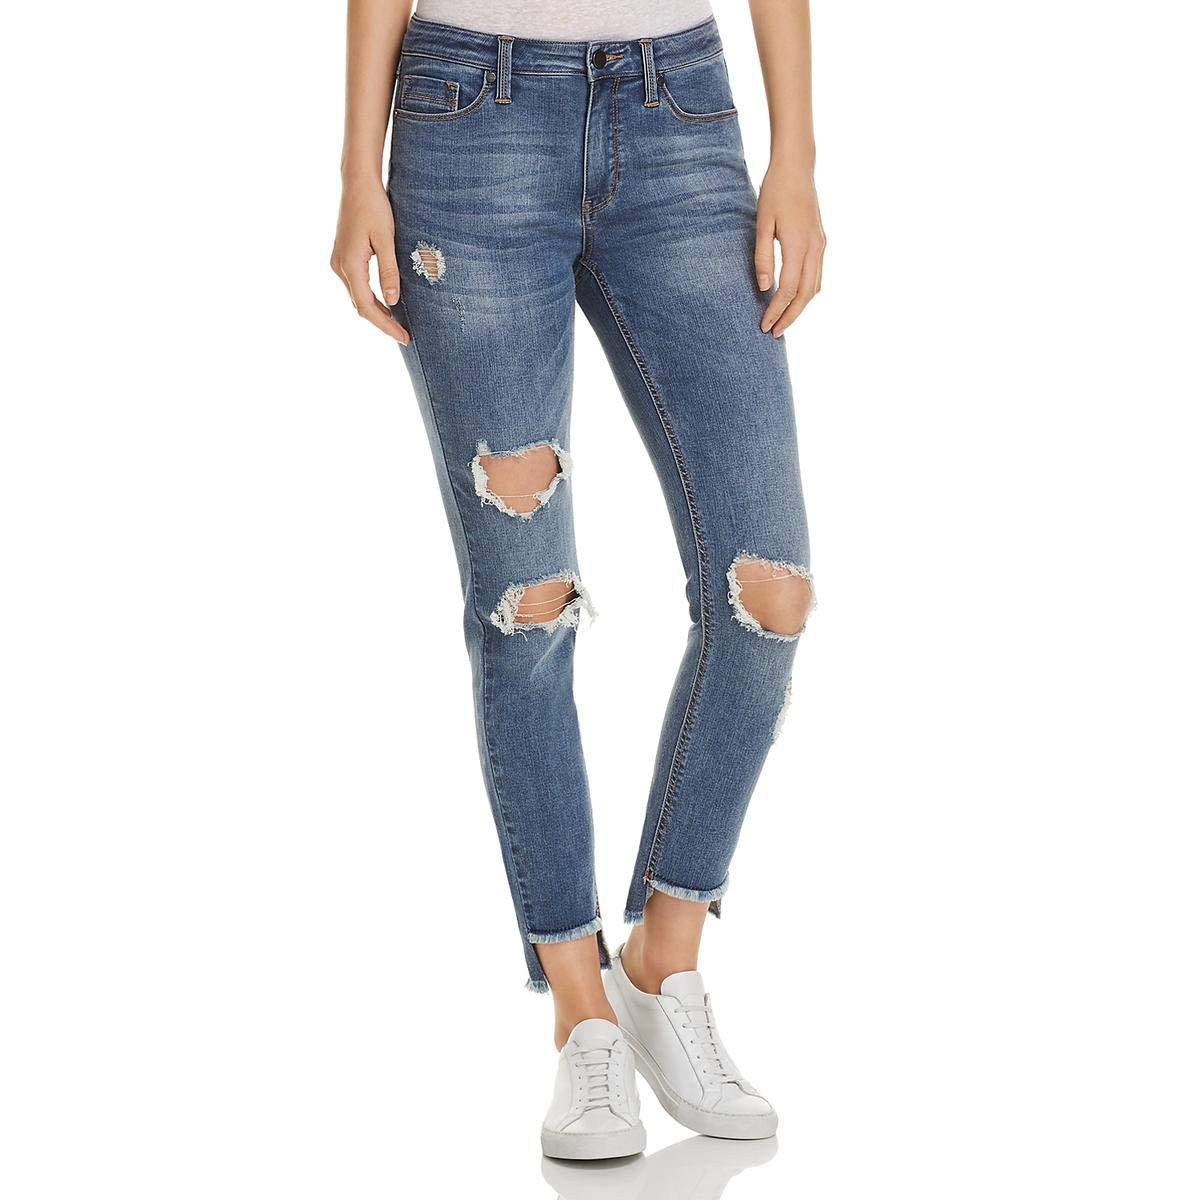 Kenneth Cole Womens Jess Skinny Jean with Step Hem